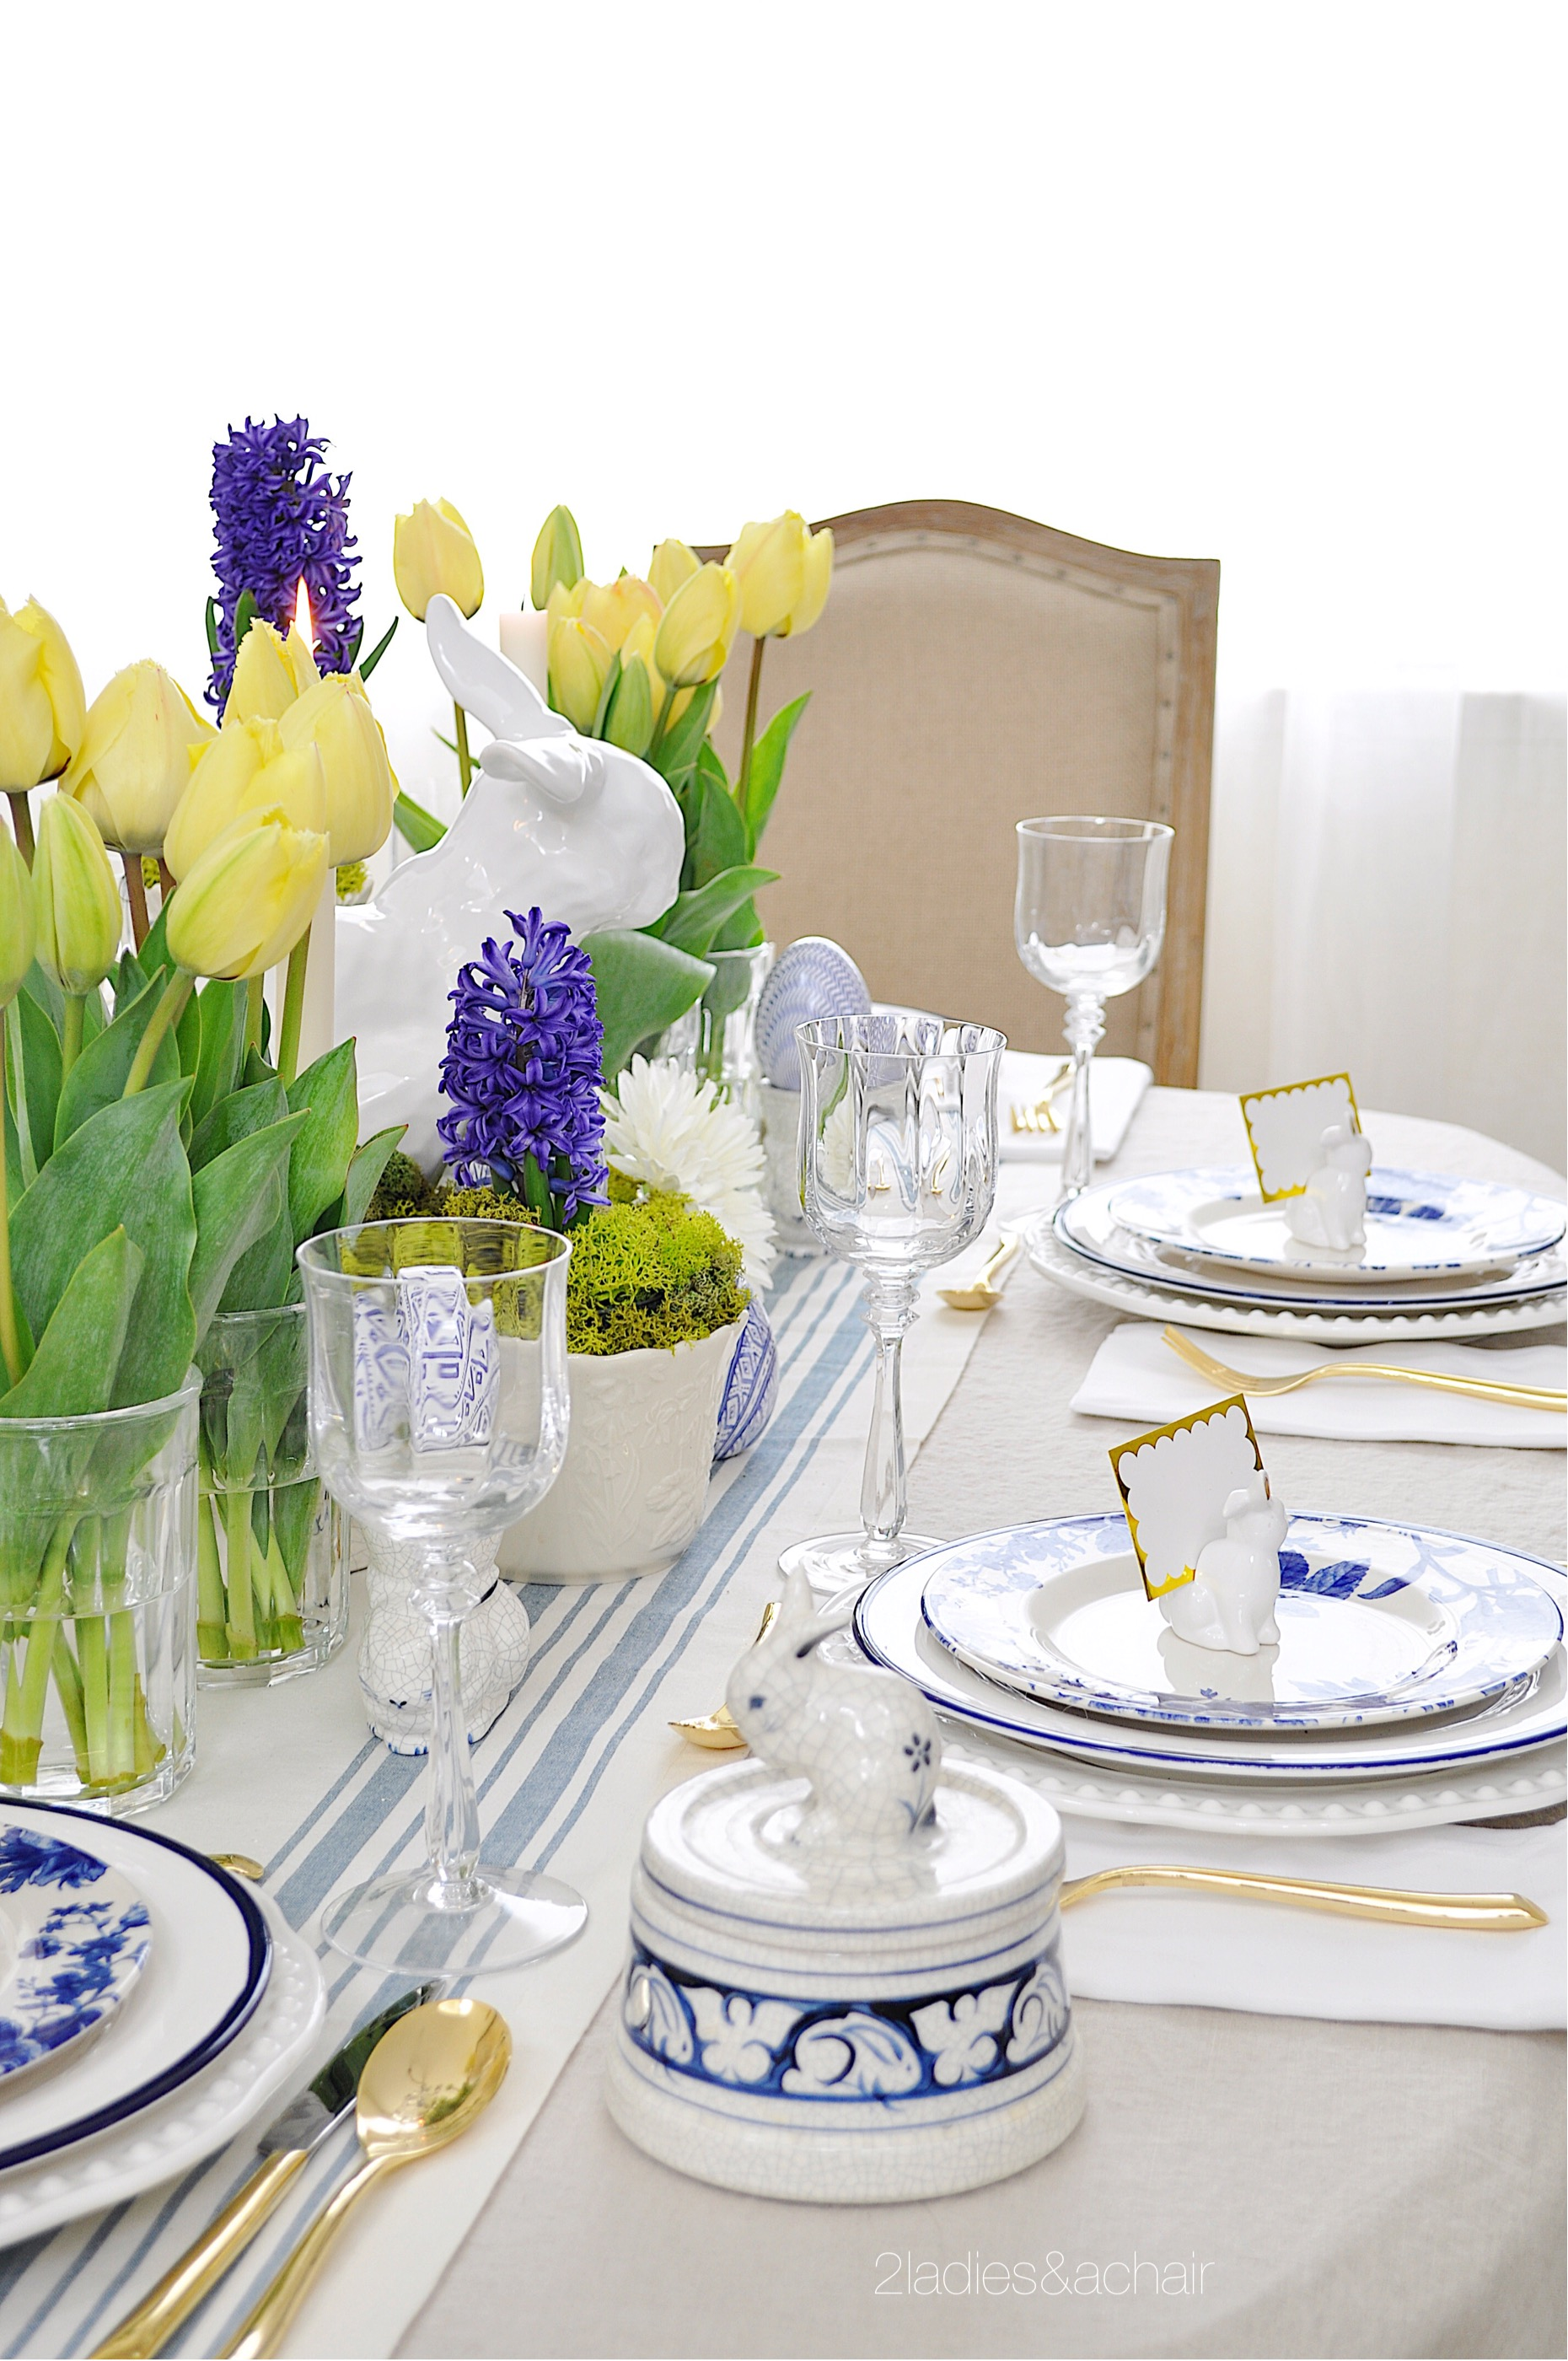 easter table IMG_1800.JPG